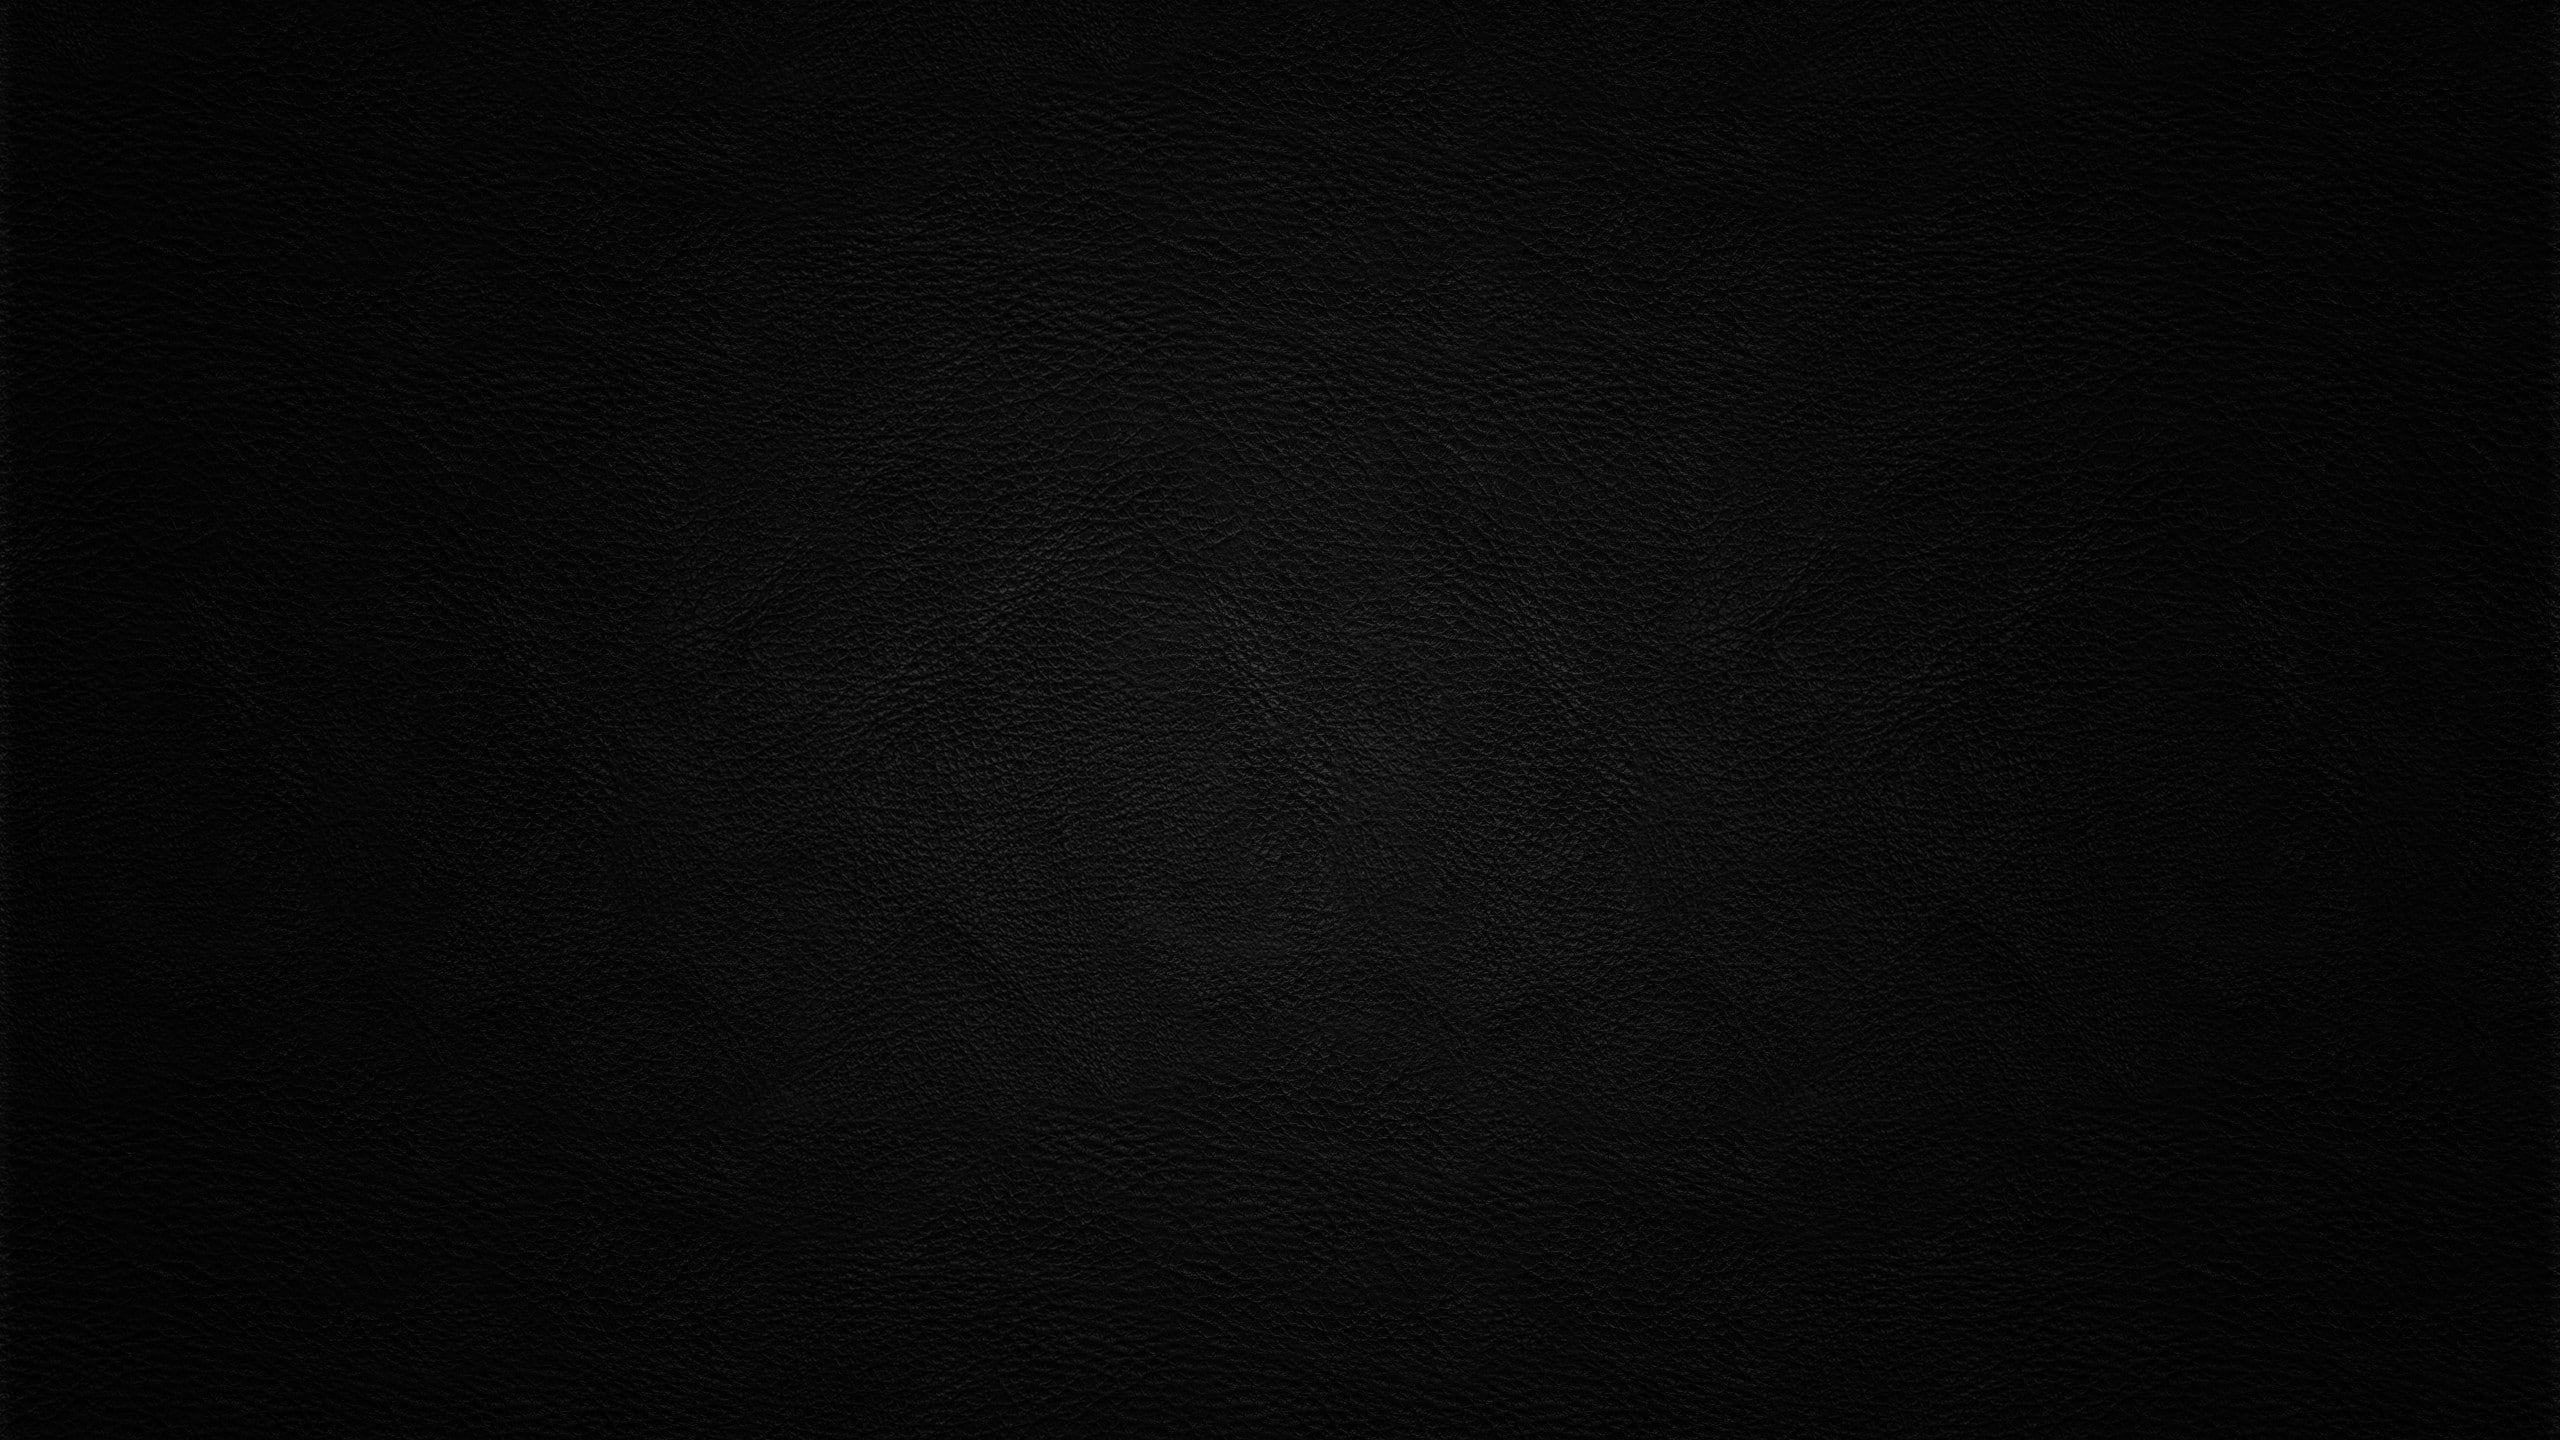 Textured Dark Black Leather 2k Wallpaper Hdwallpaper Desktop Monarch Specialties Black Wallpaper Plain Wallpaper